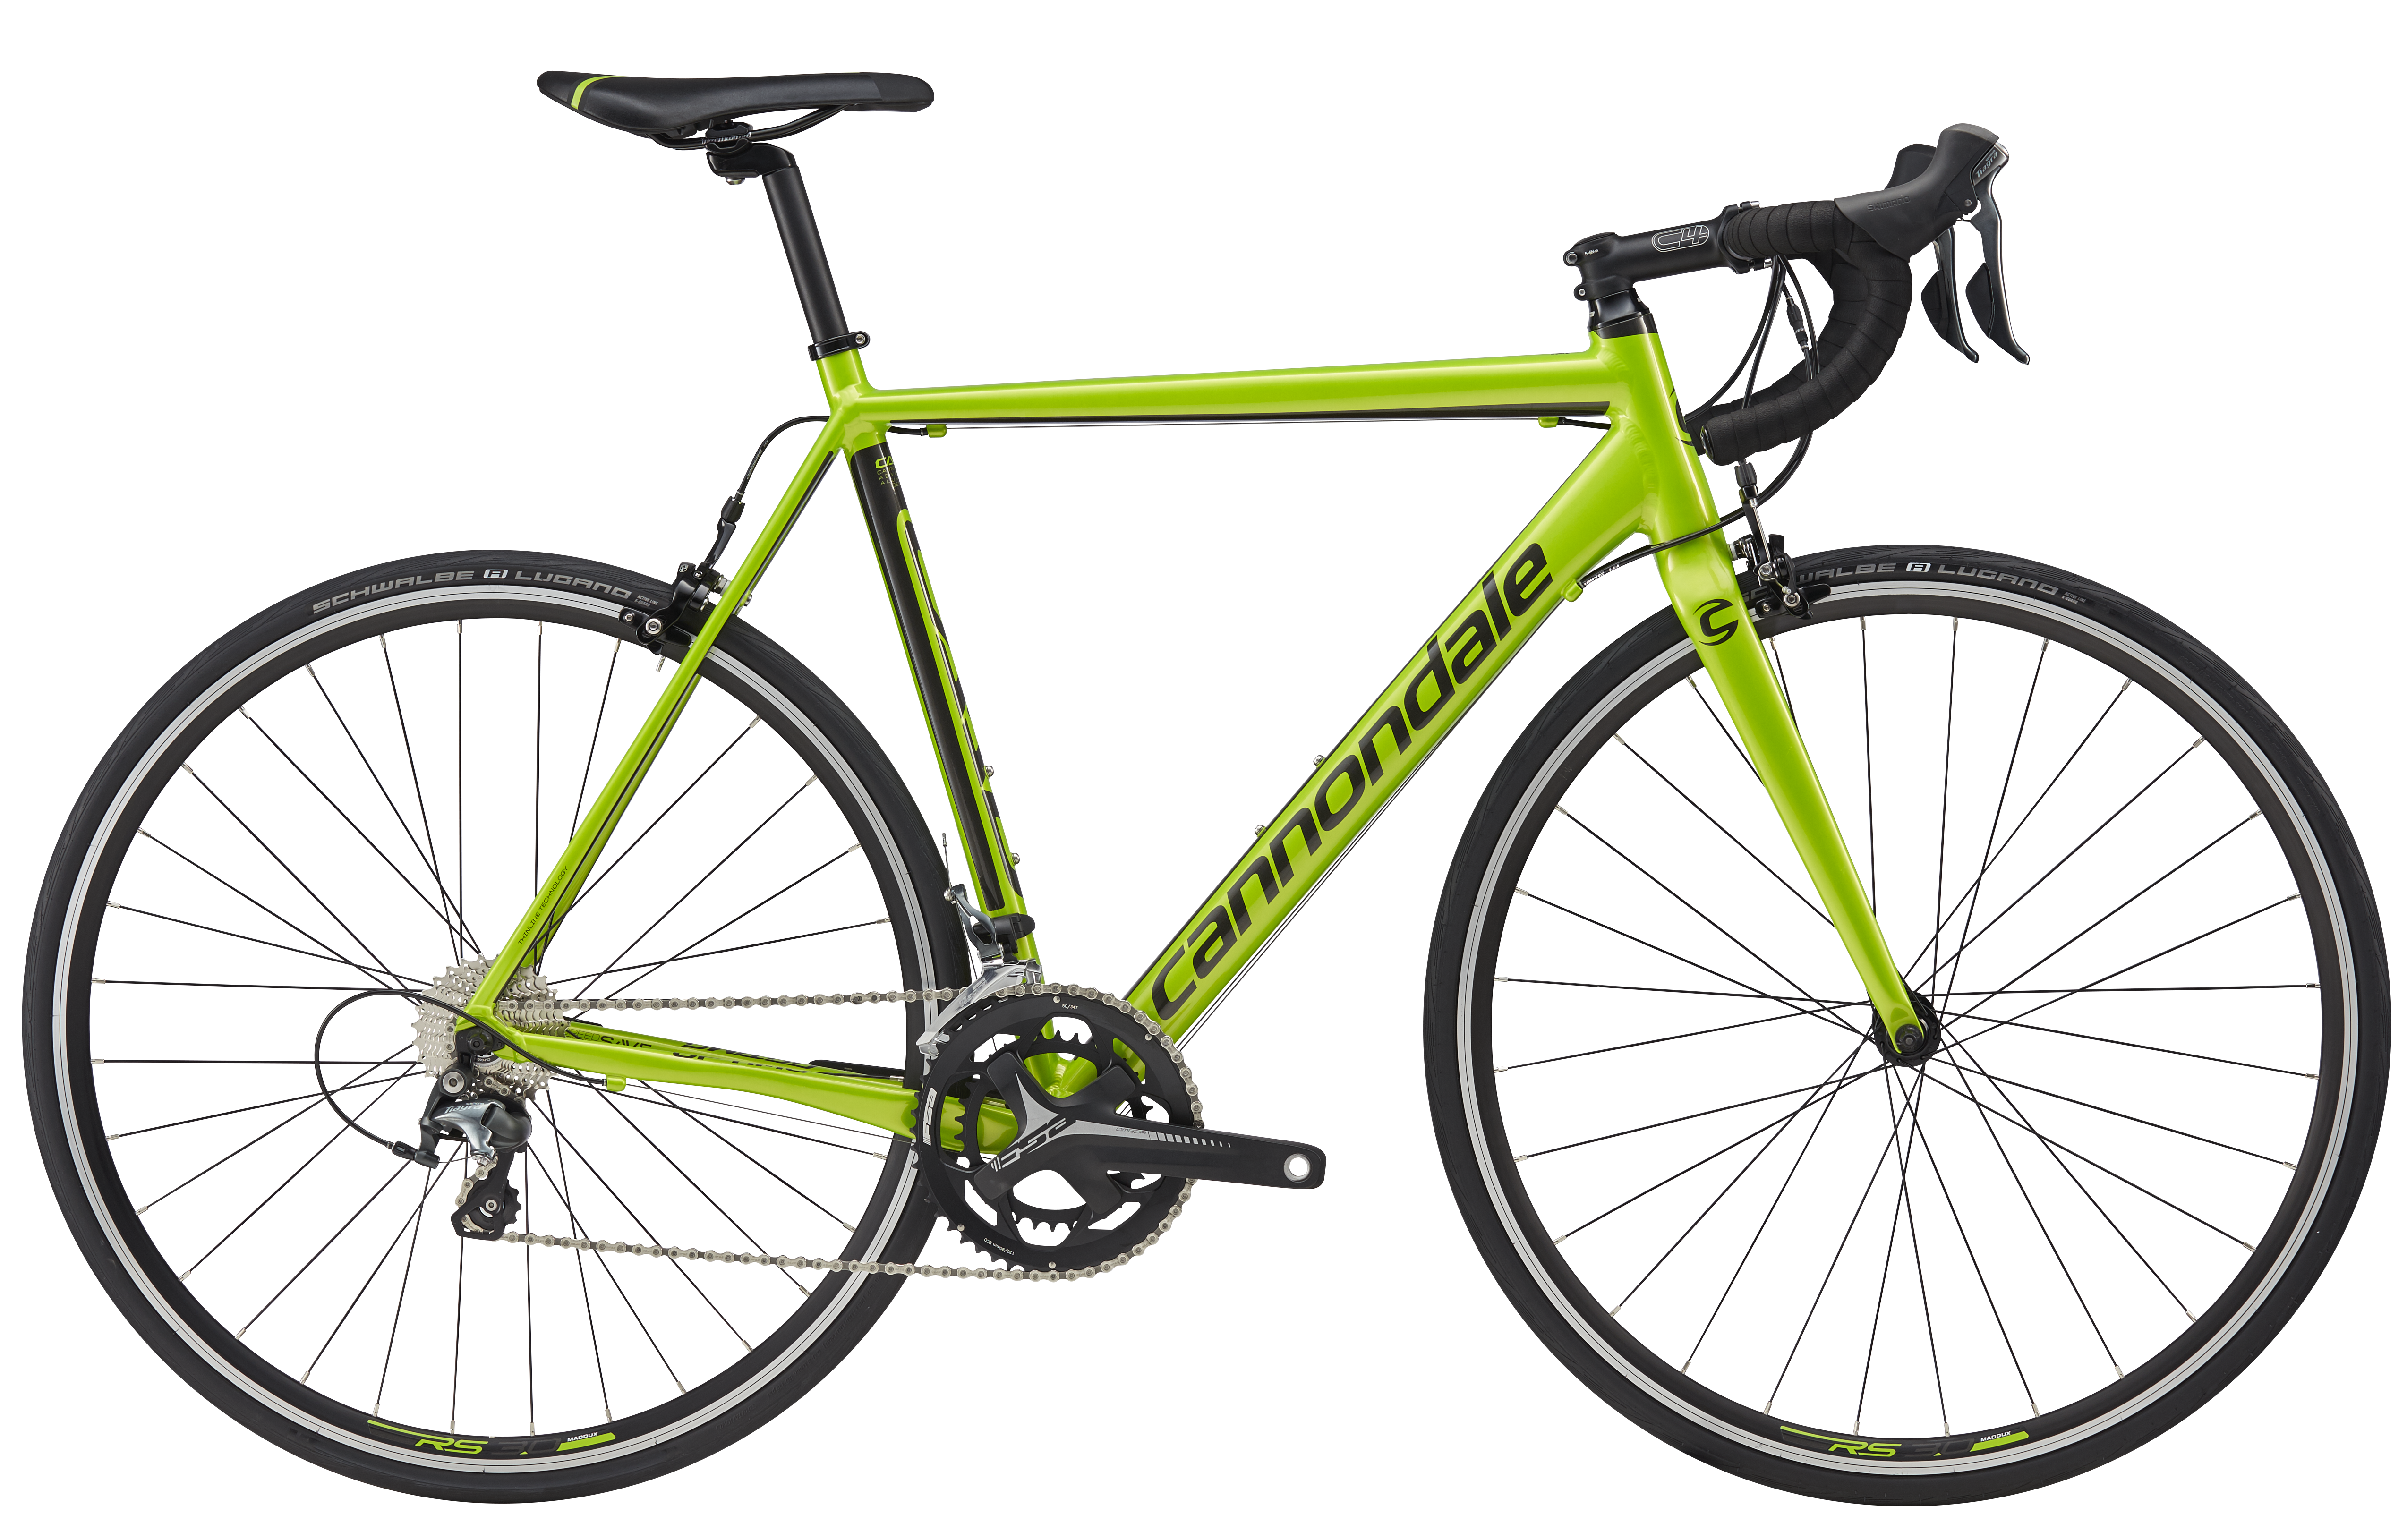 Caad Optimo Tiagra Mountain Bikes Road Bikes Ebikes Cannondale